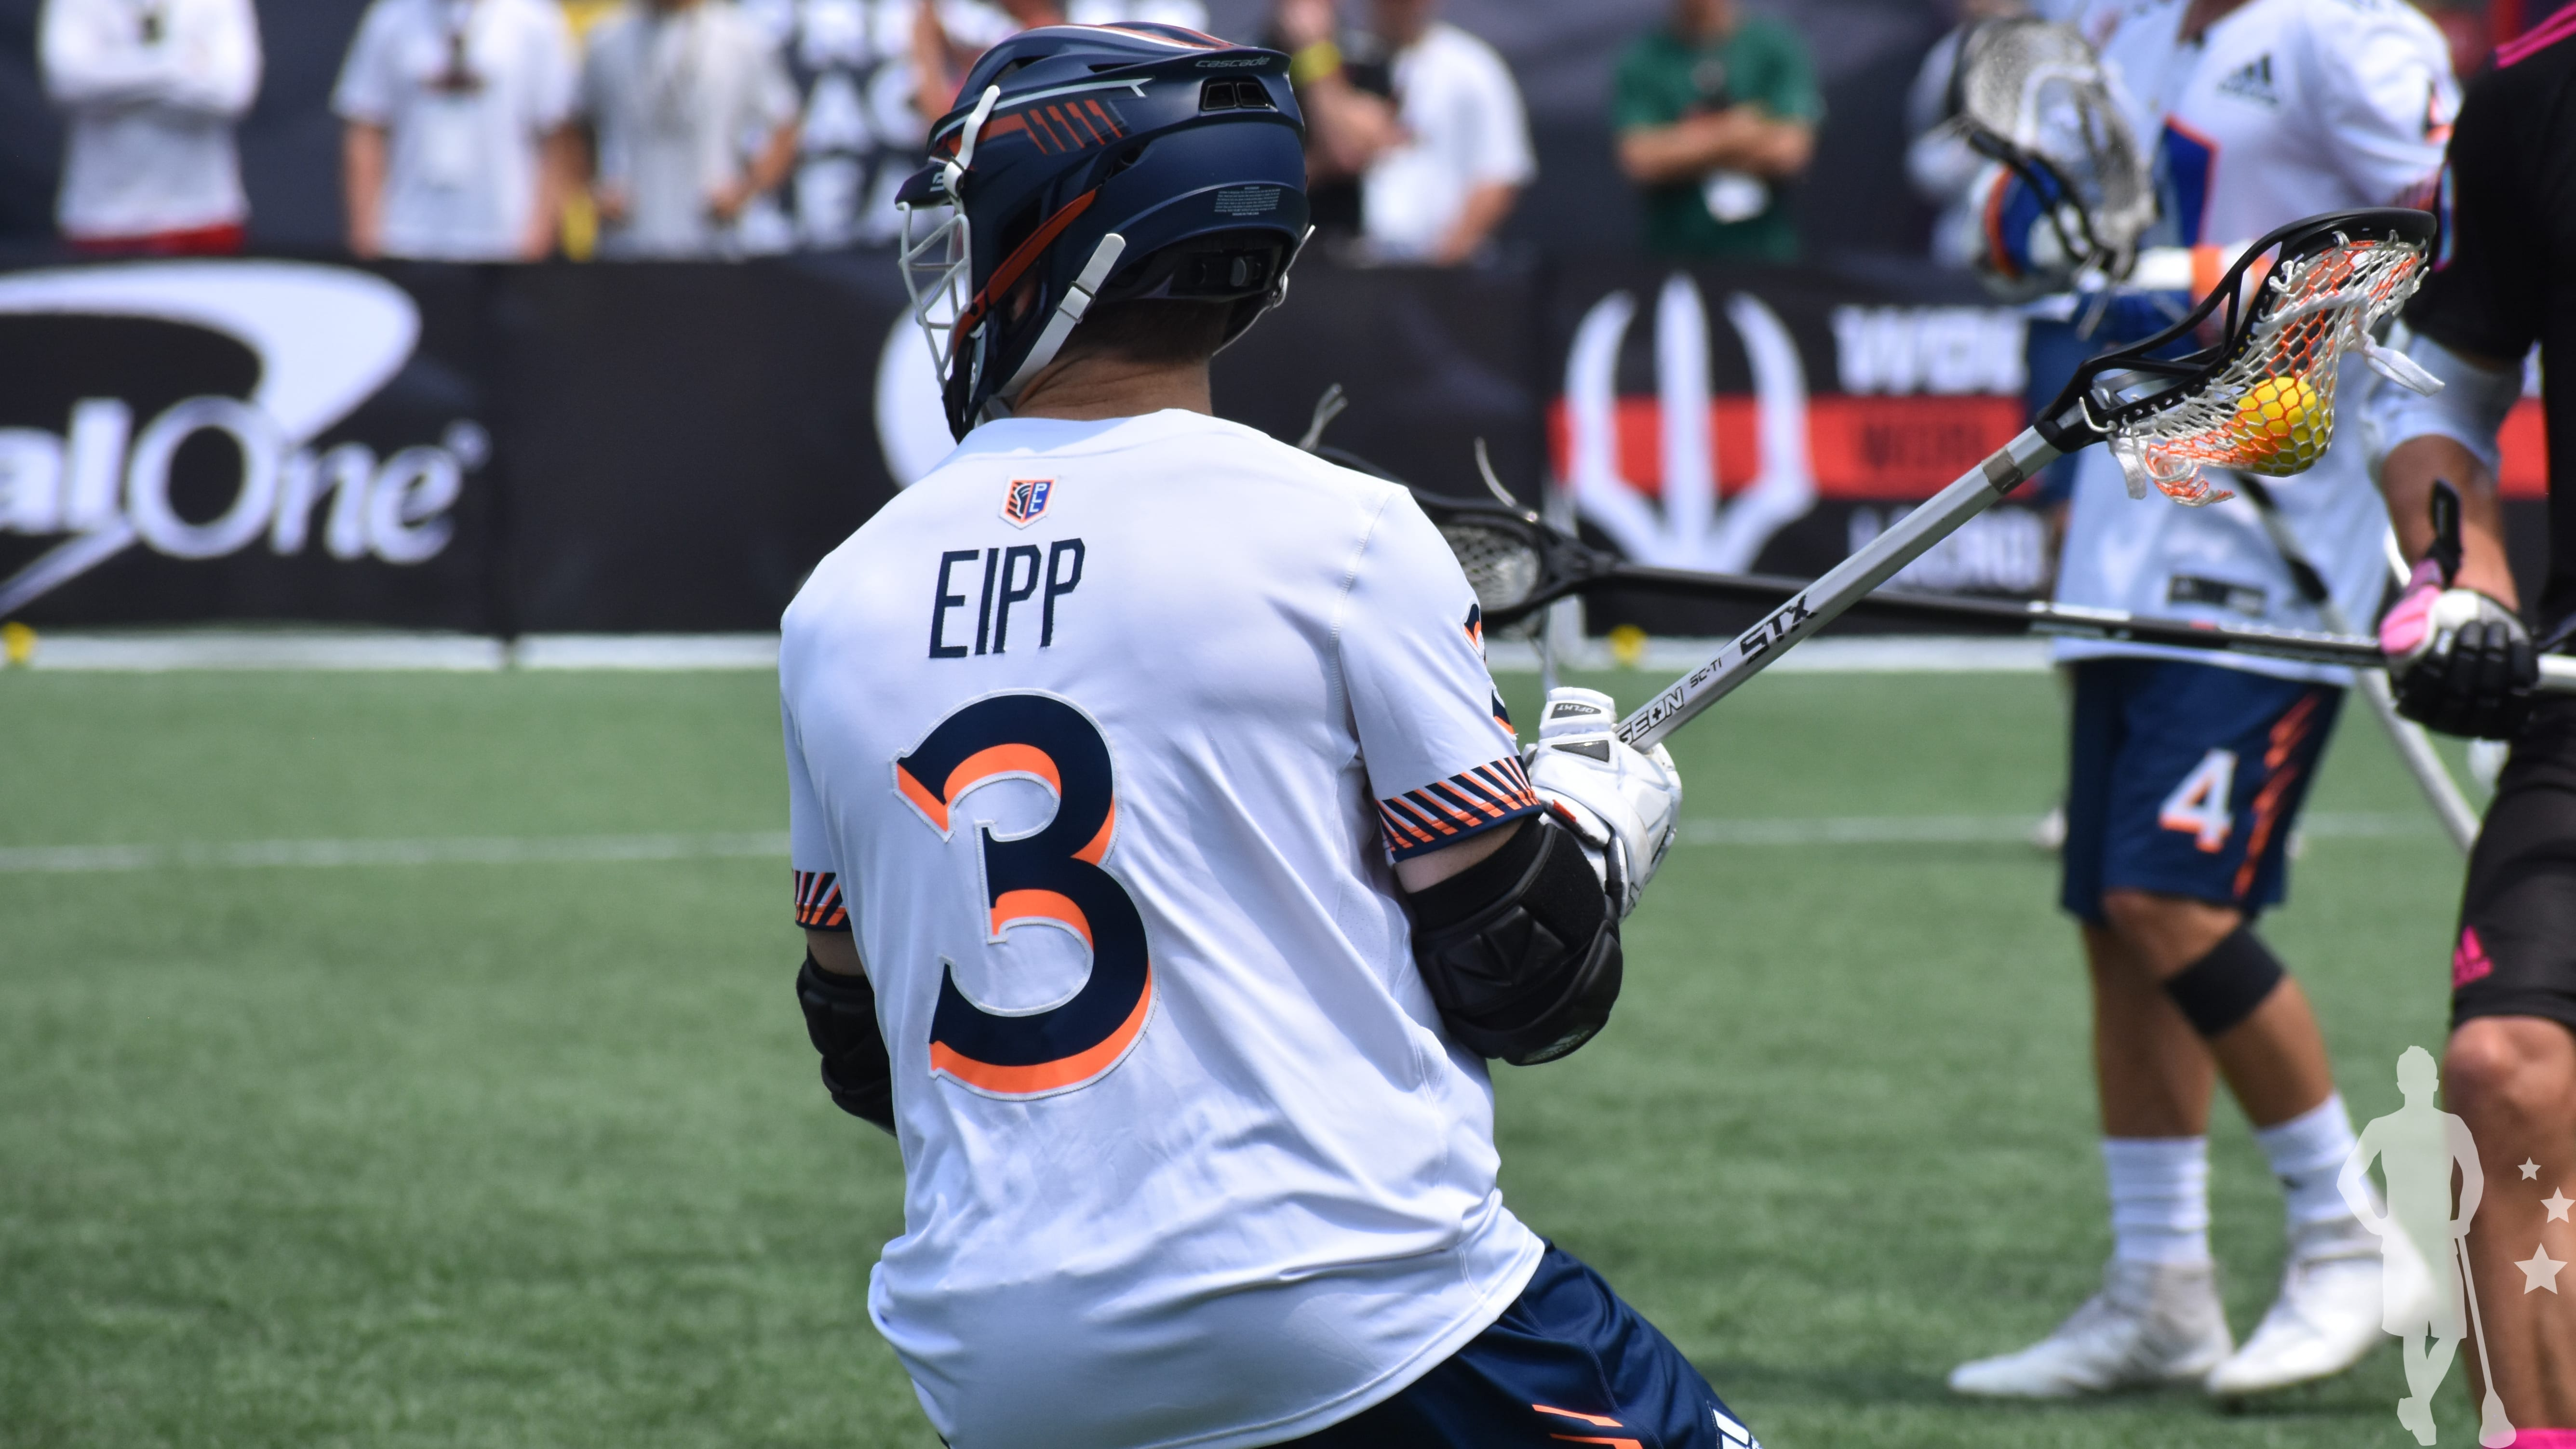 Waterdogs Eipp Chrome v Archers Ryan Conwell PLL 2019-38